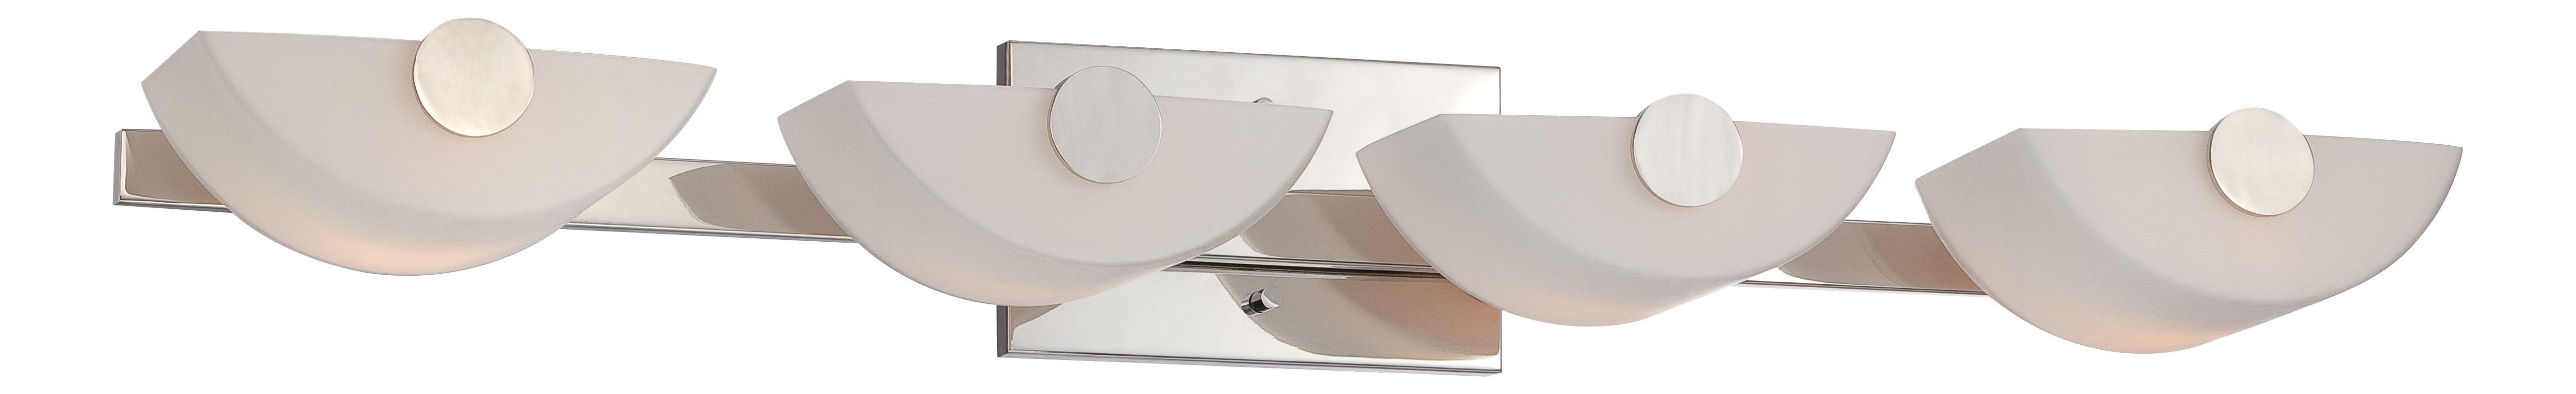 Nuvo Lighting 60/5194 Semi 4 Light Bathroom Vanity Light Polished